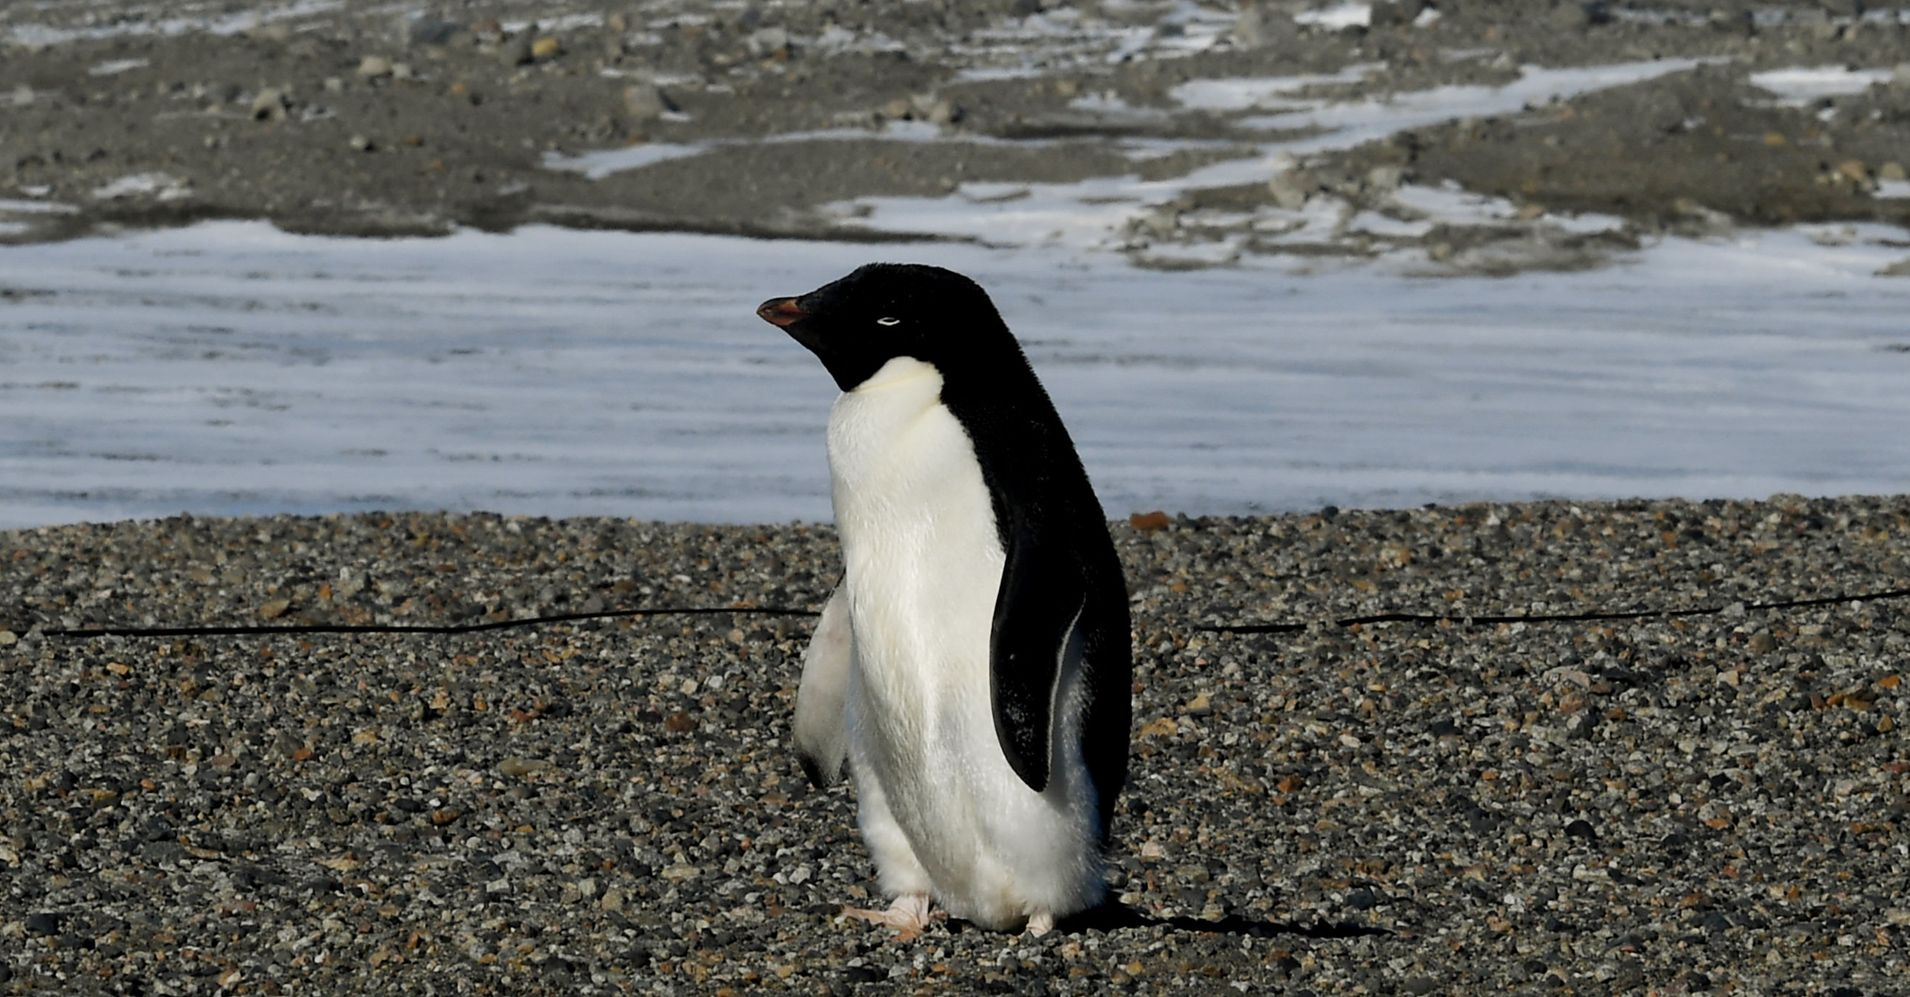 Scientists Press For Antarctic Sanctuary After Massive Penguin Chick Die-Off